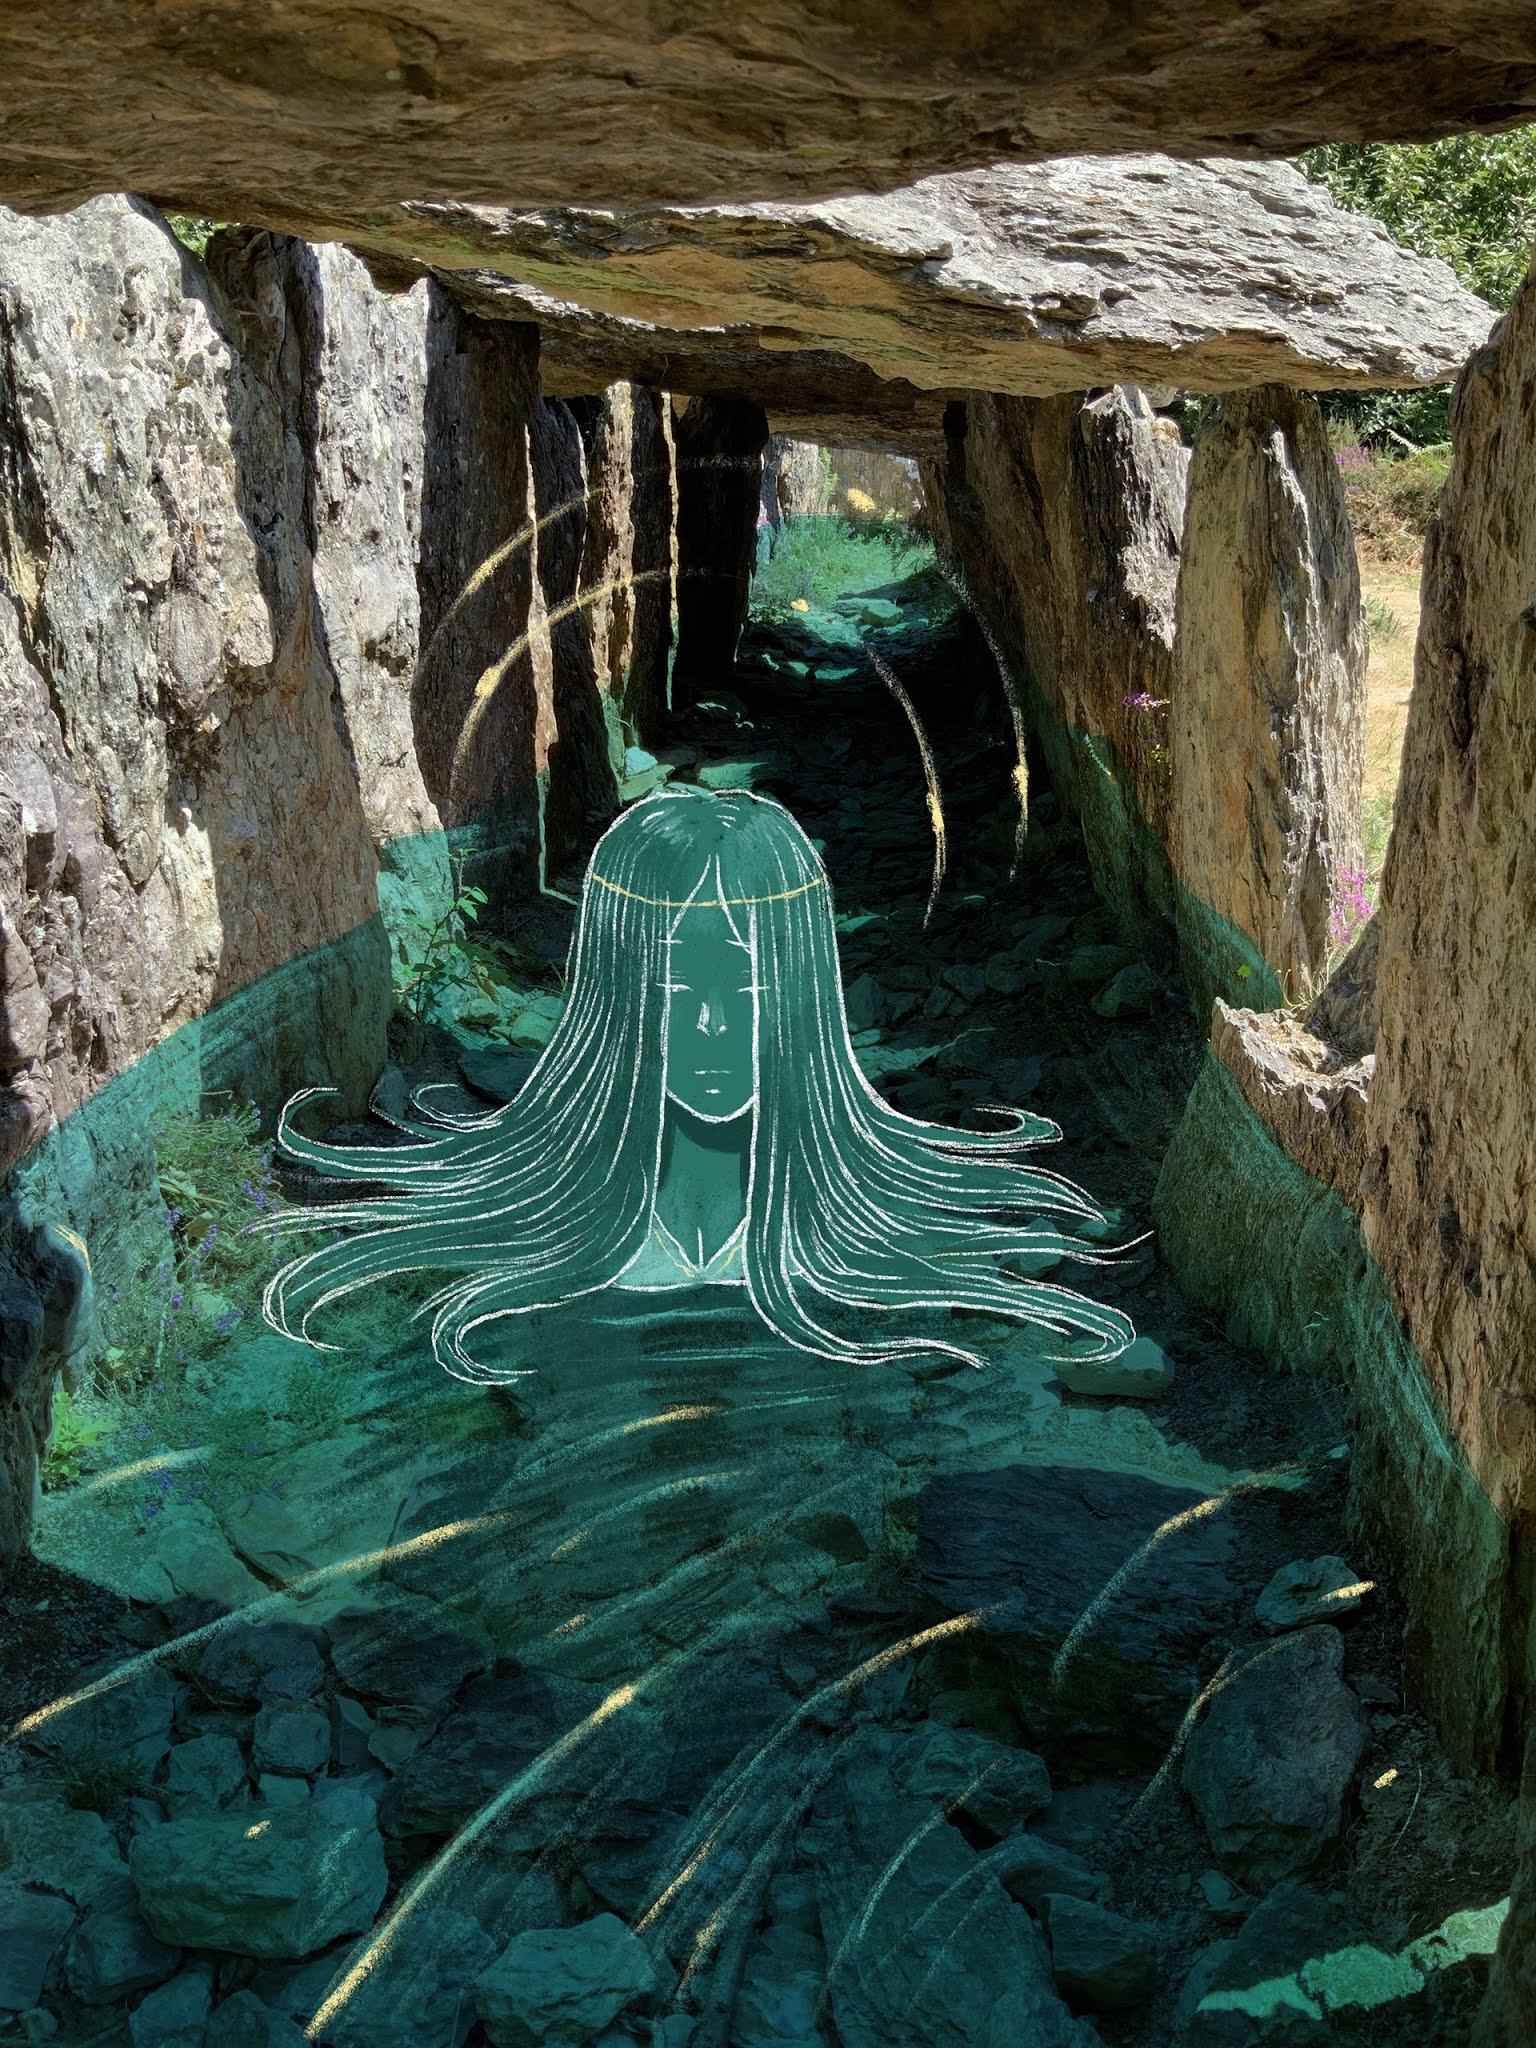 Saint-Just megaliths faerie illustration